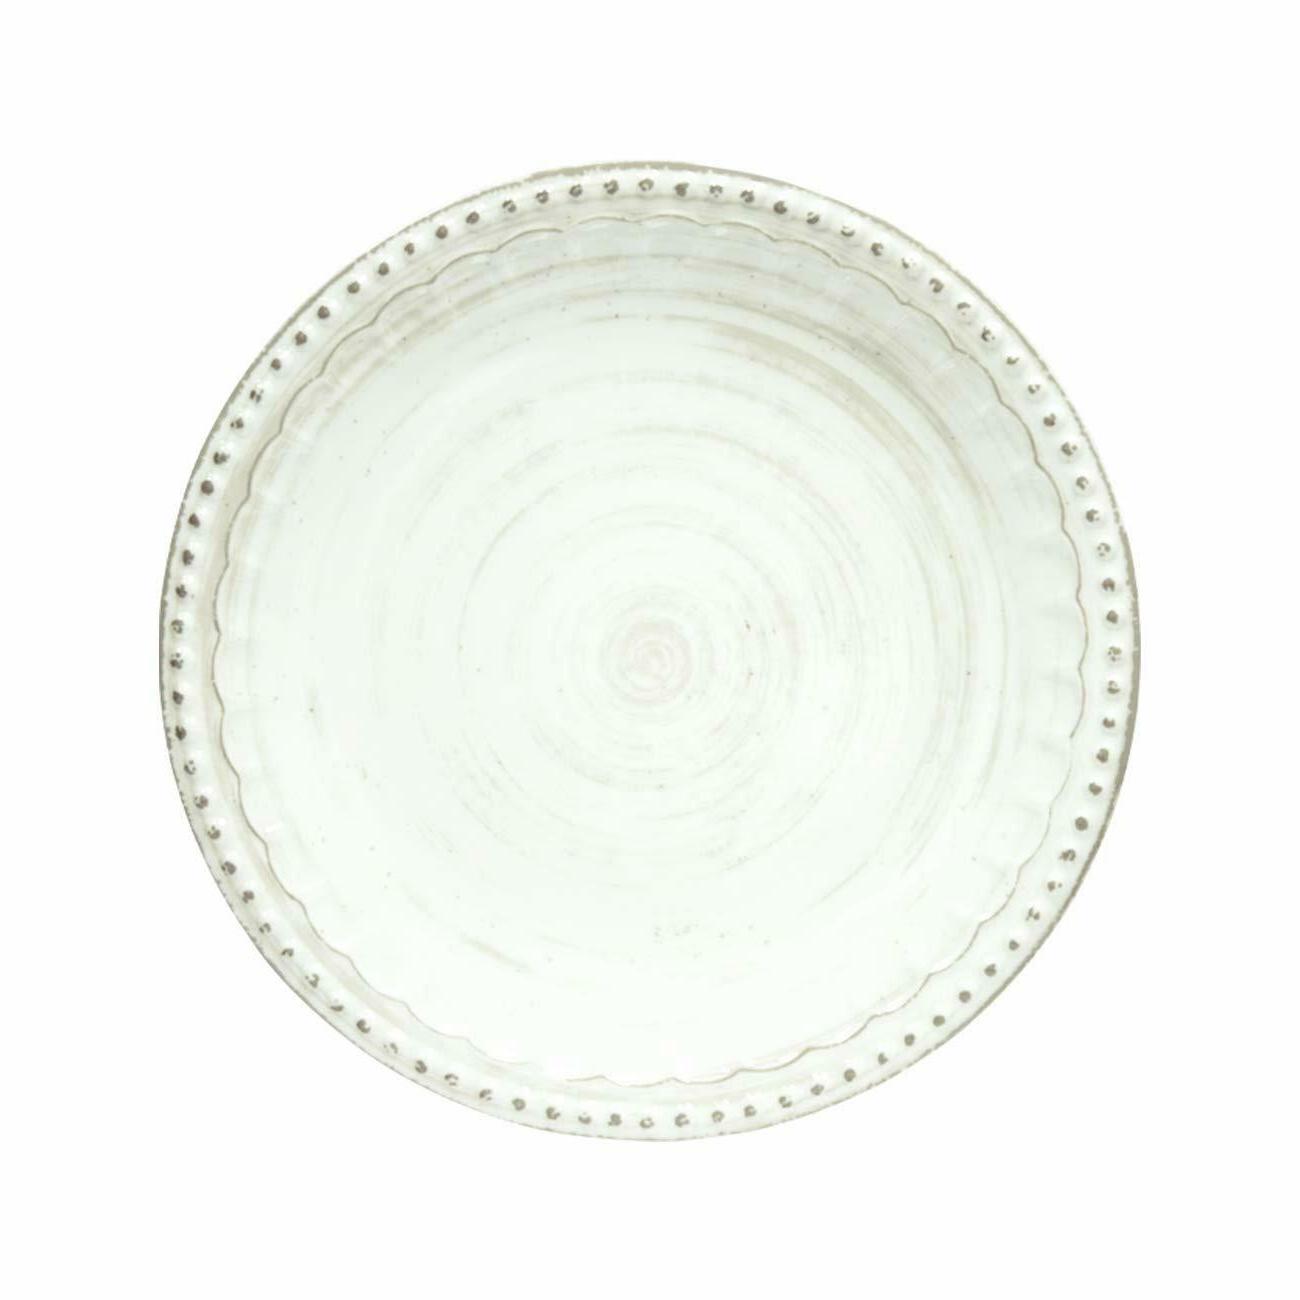 Zak! House Dinnerware 12-Piece Set Lavage Oyster